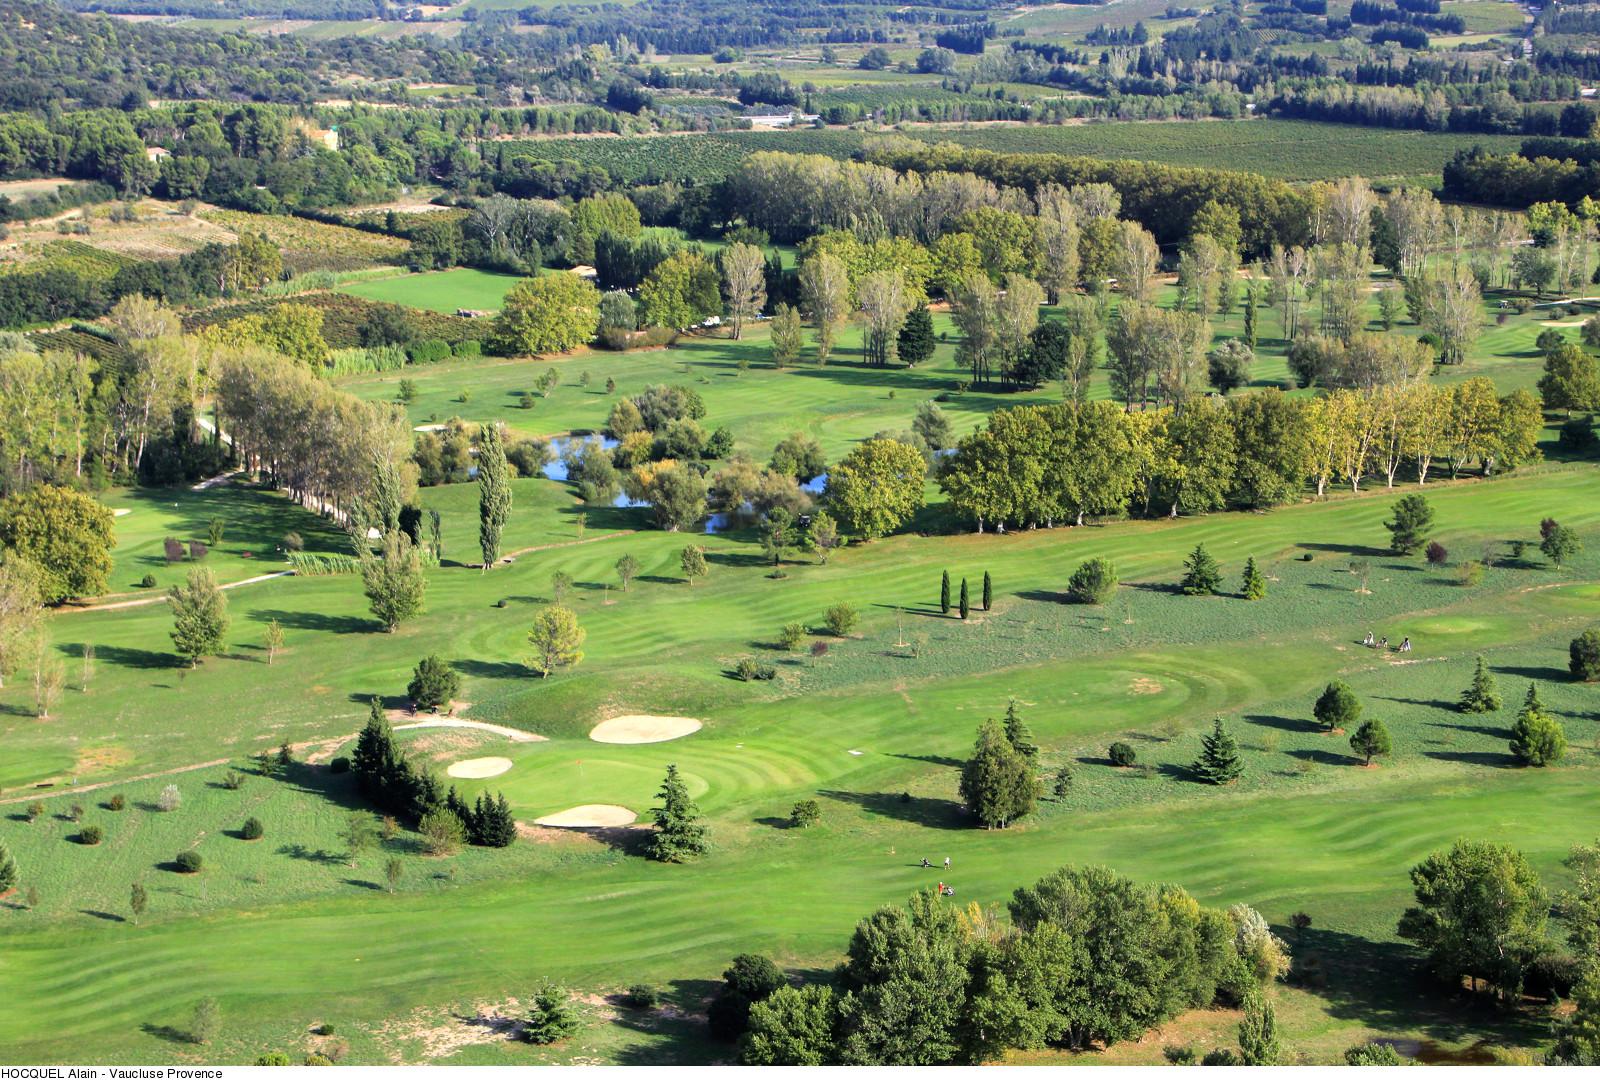 Autres loisirs - accrobranches, golf, escalade, équitation